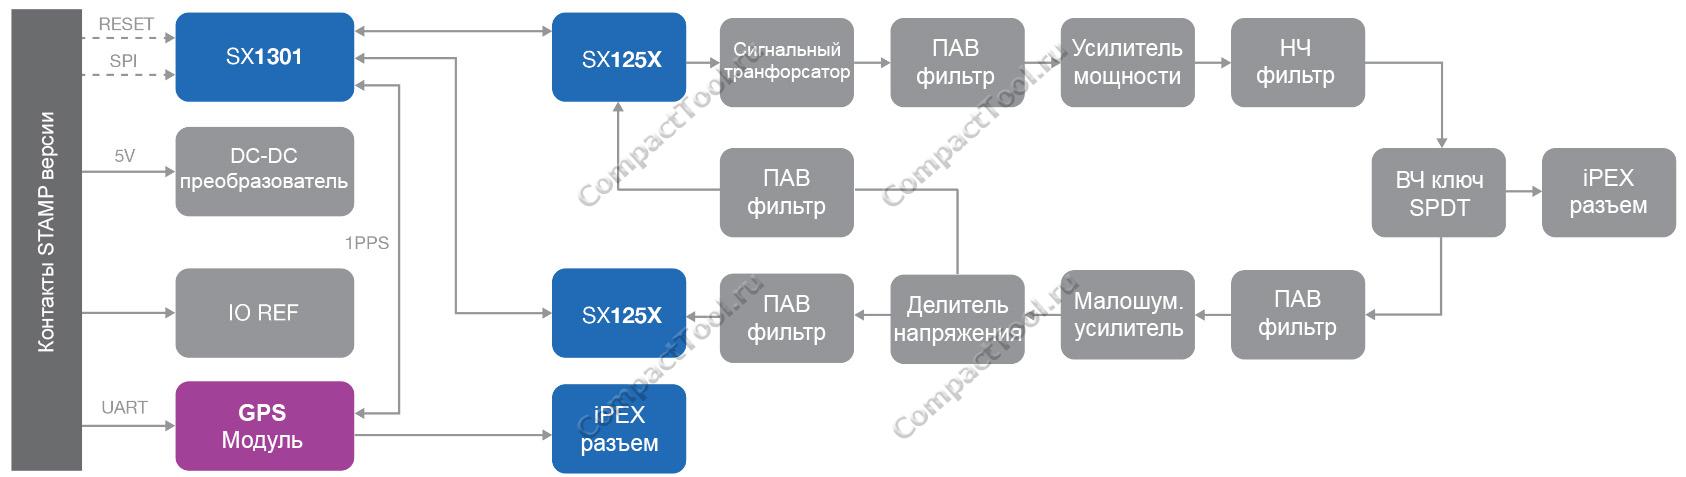 Блок-схема RAK2245 Stamp Edition